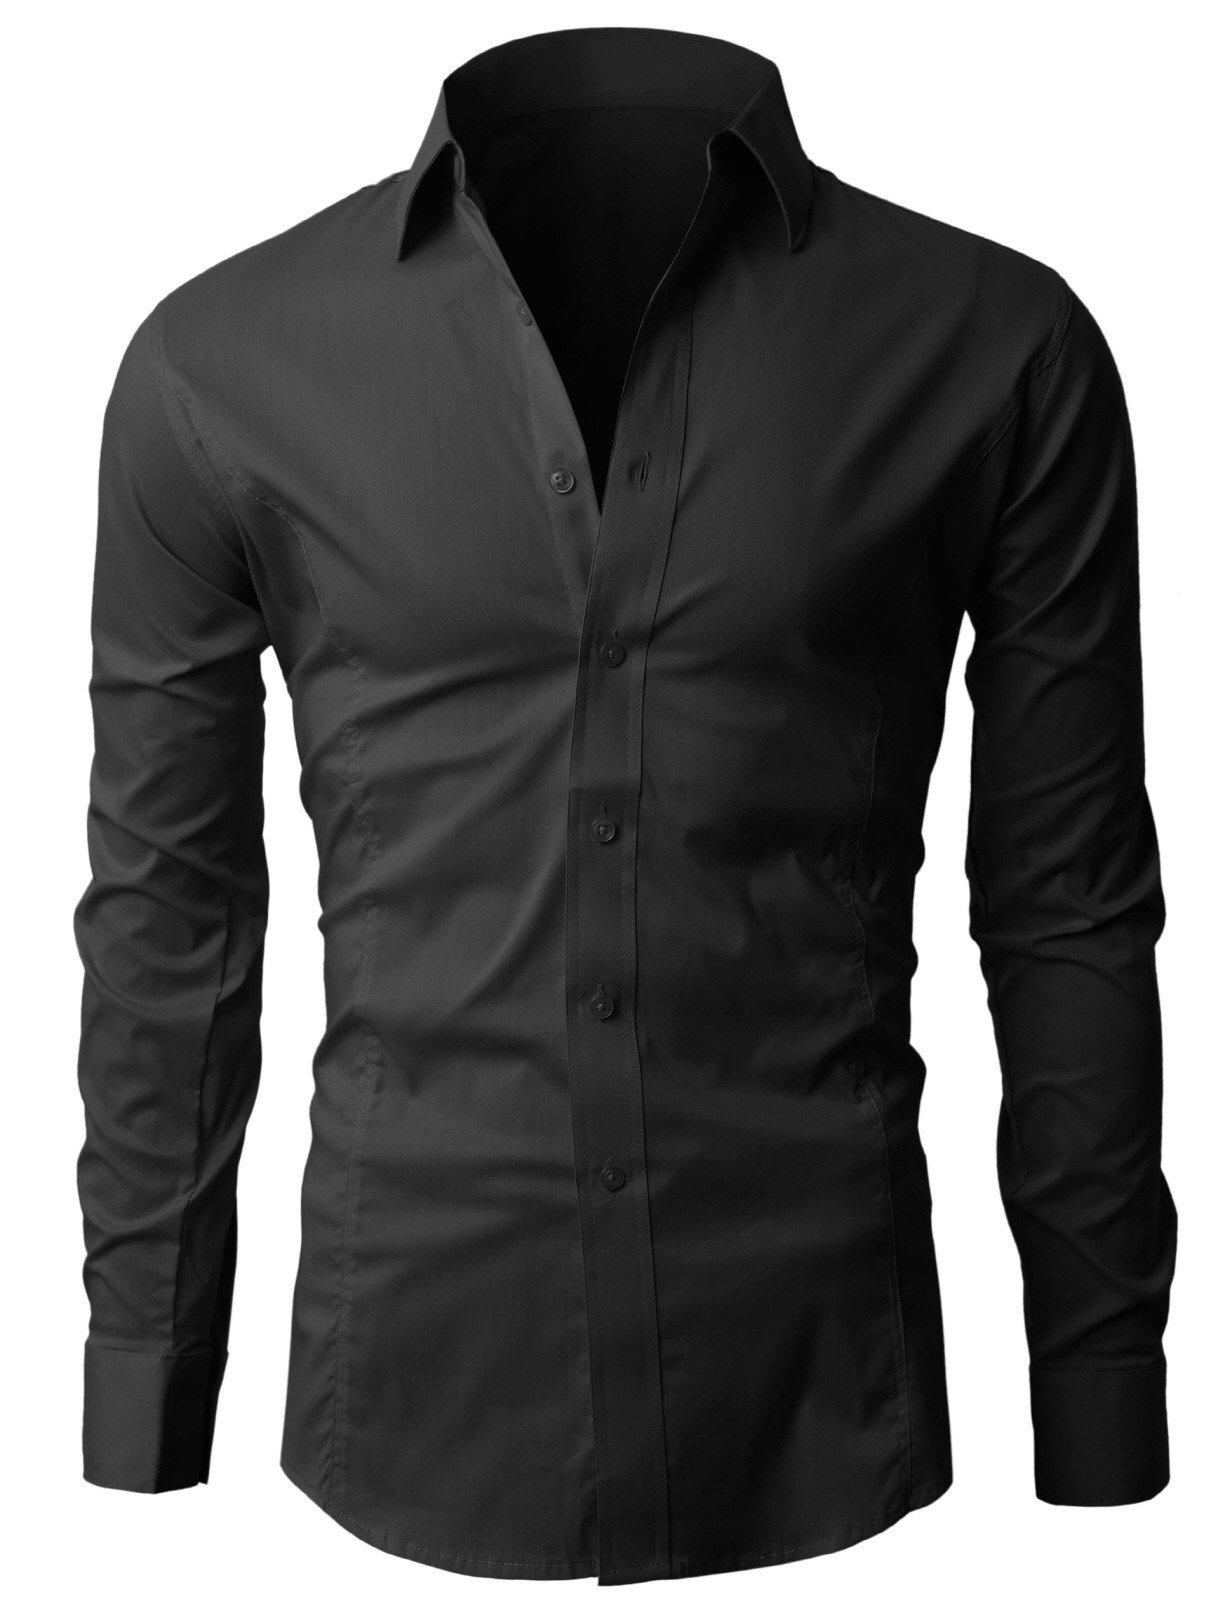 Lyon Becker® Men's Shirts Long Sleeve Slim Fit Casual Formal Shirt Basic Plain Dress Office PS01